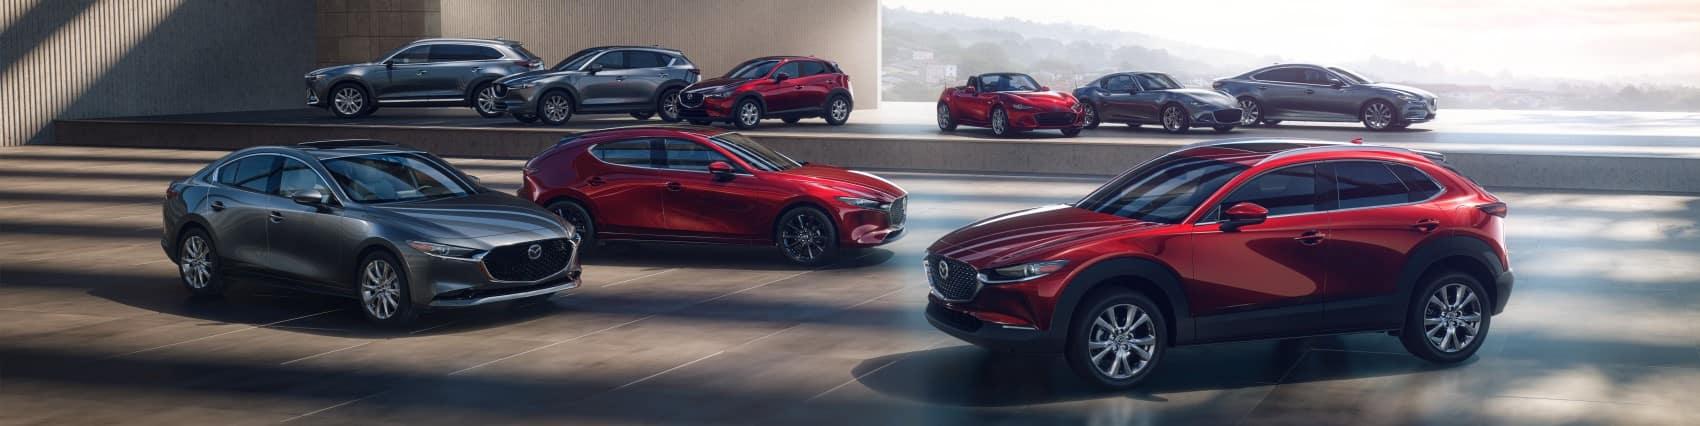 2020 Mazda lineup parked in parking garage